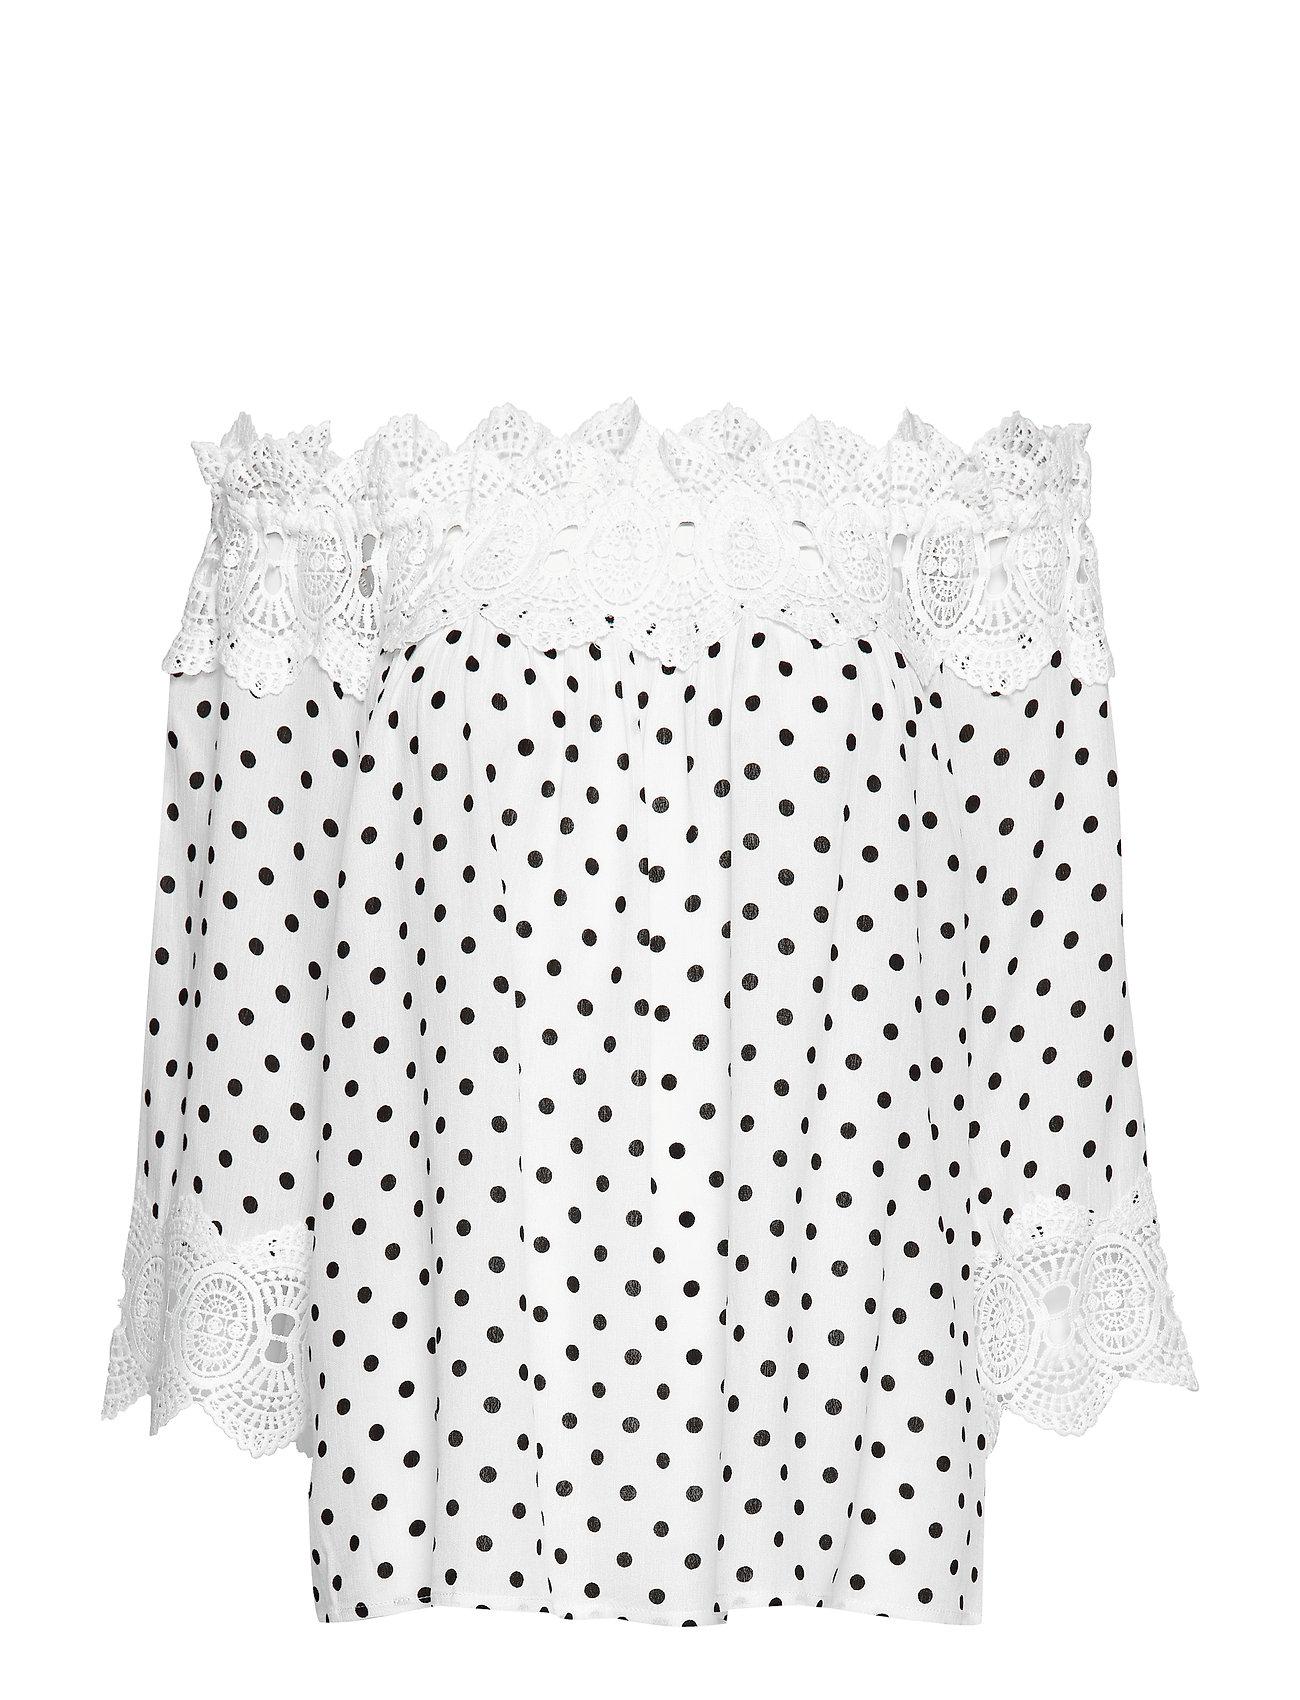 Cream Bea Dot blouse - CHALK WITH BLACK DOTS